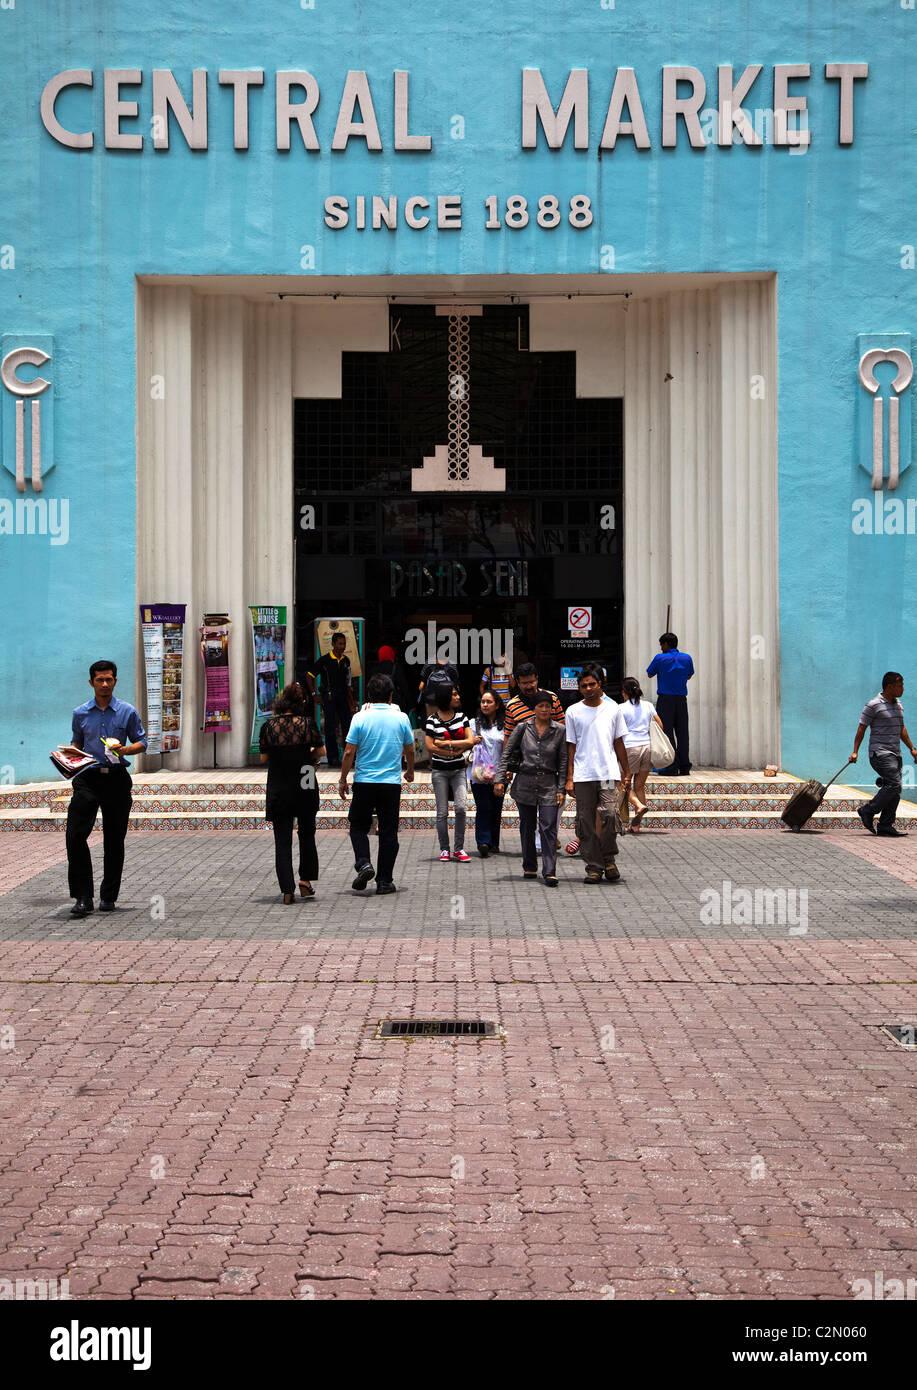 Central Market, Kuala Lumpur - Stock Image